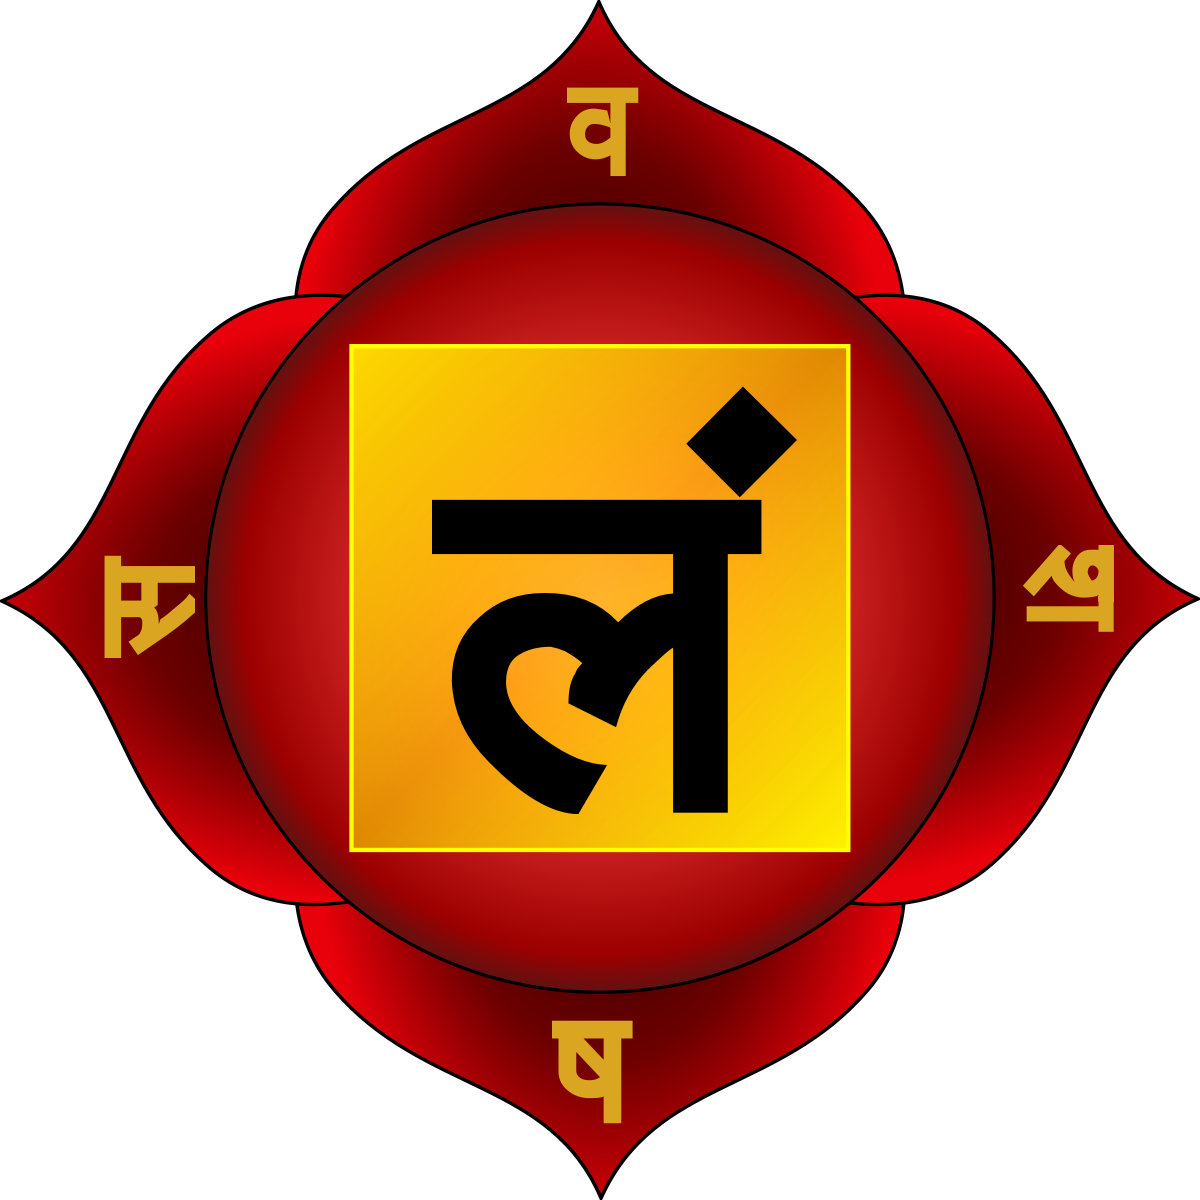 Mooladhara chakra (Root chakra)